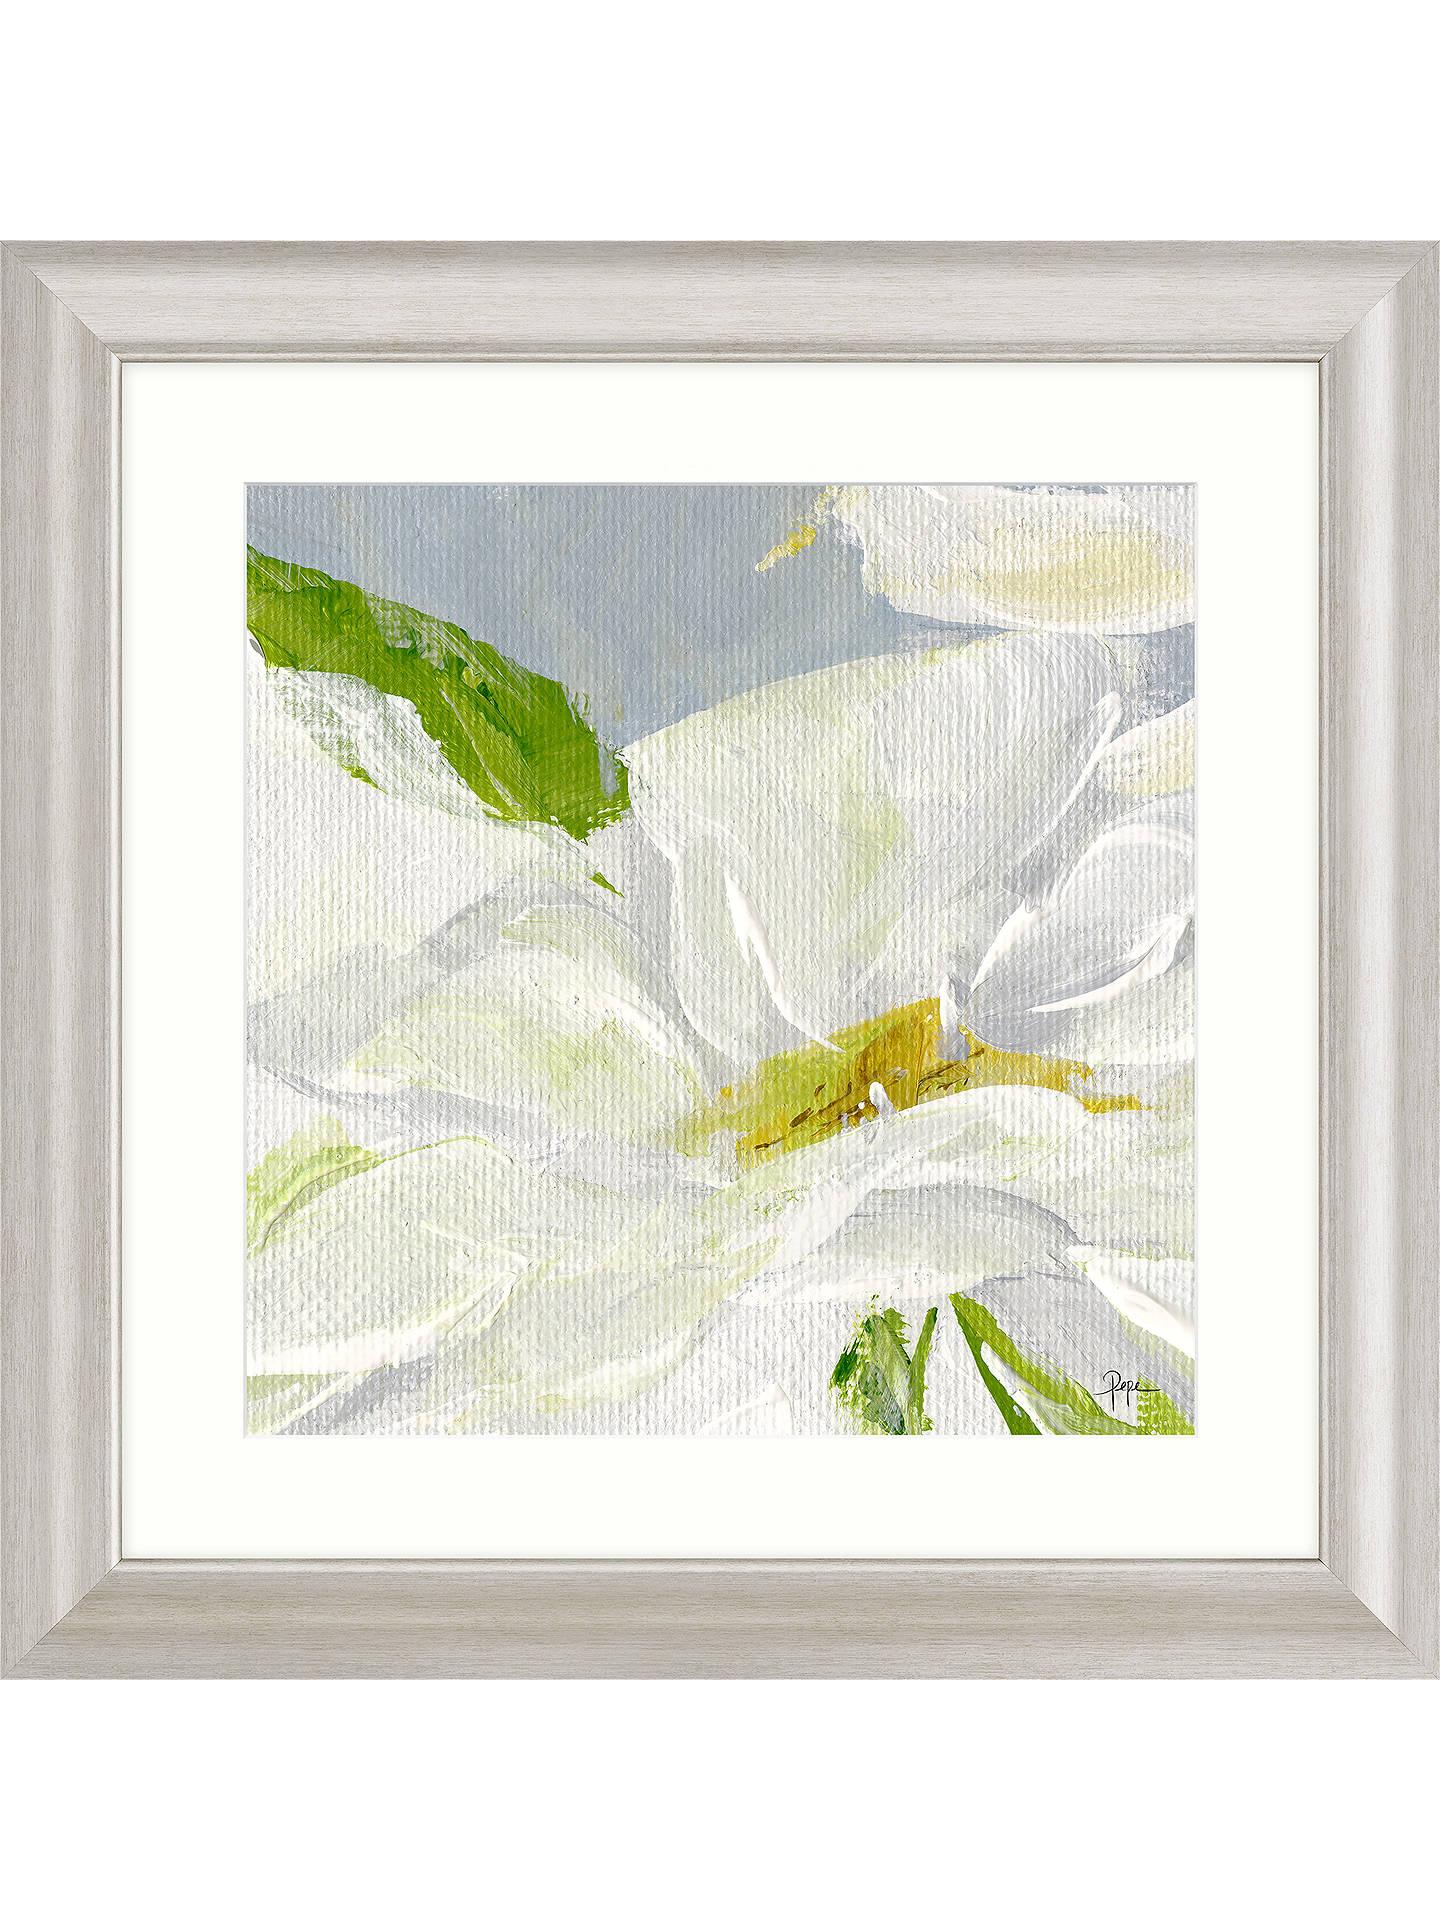 Susan Pepe Single Daisy Framed Print & Mount, 68.5 x 68.5cm